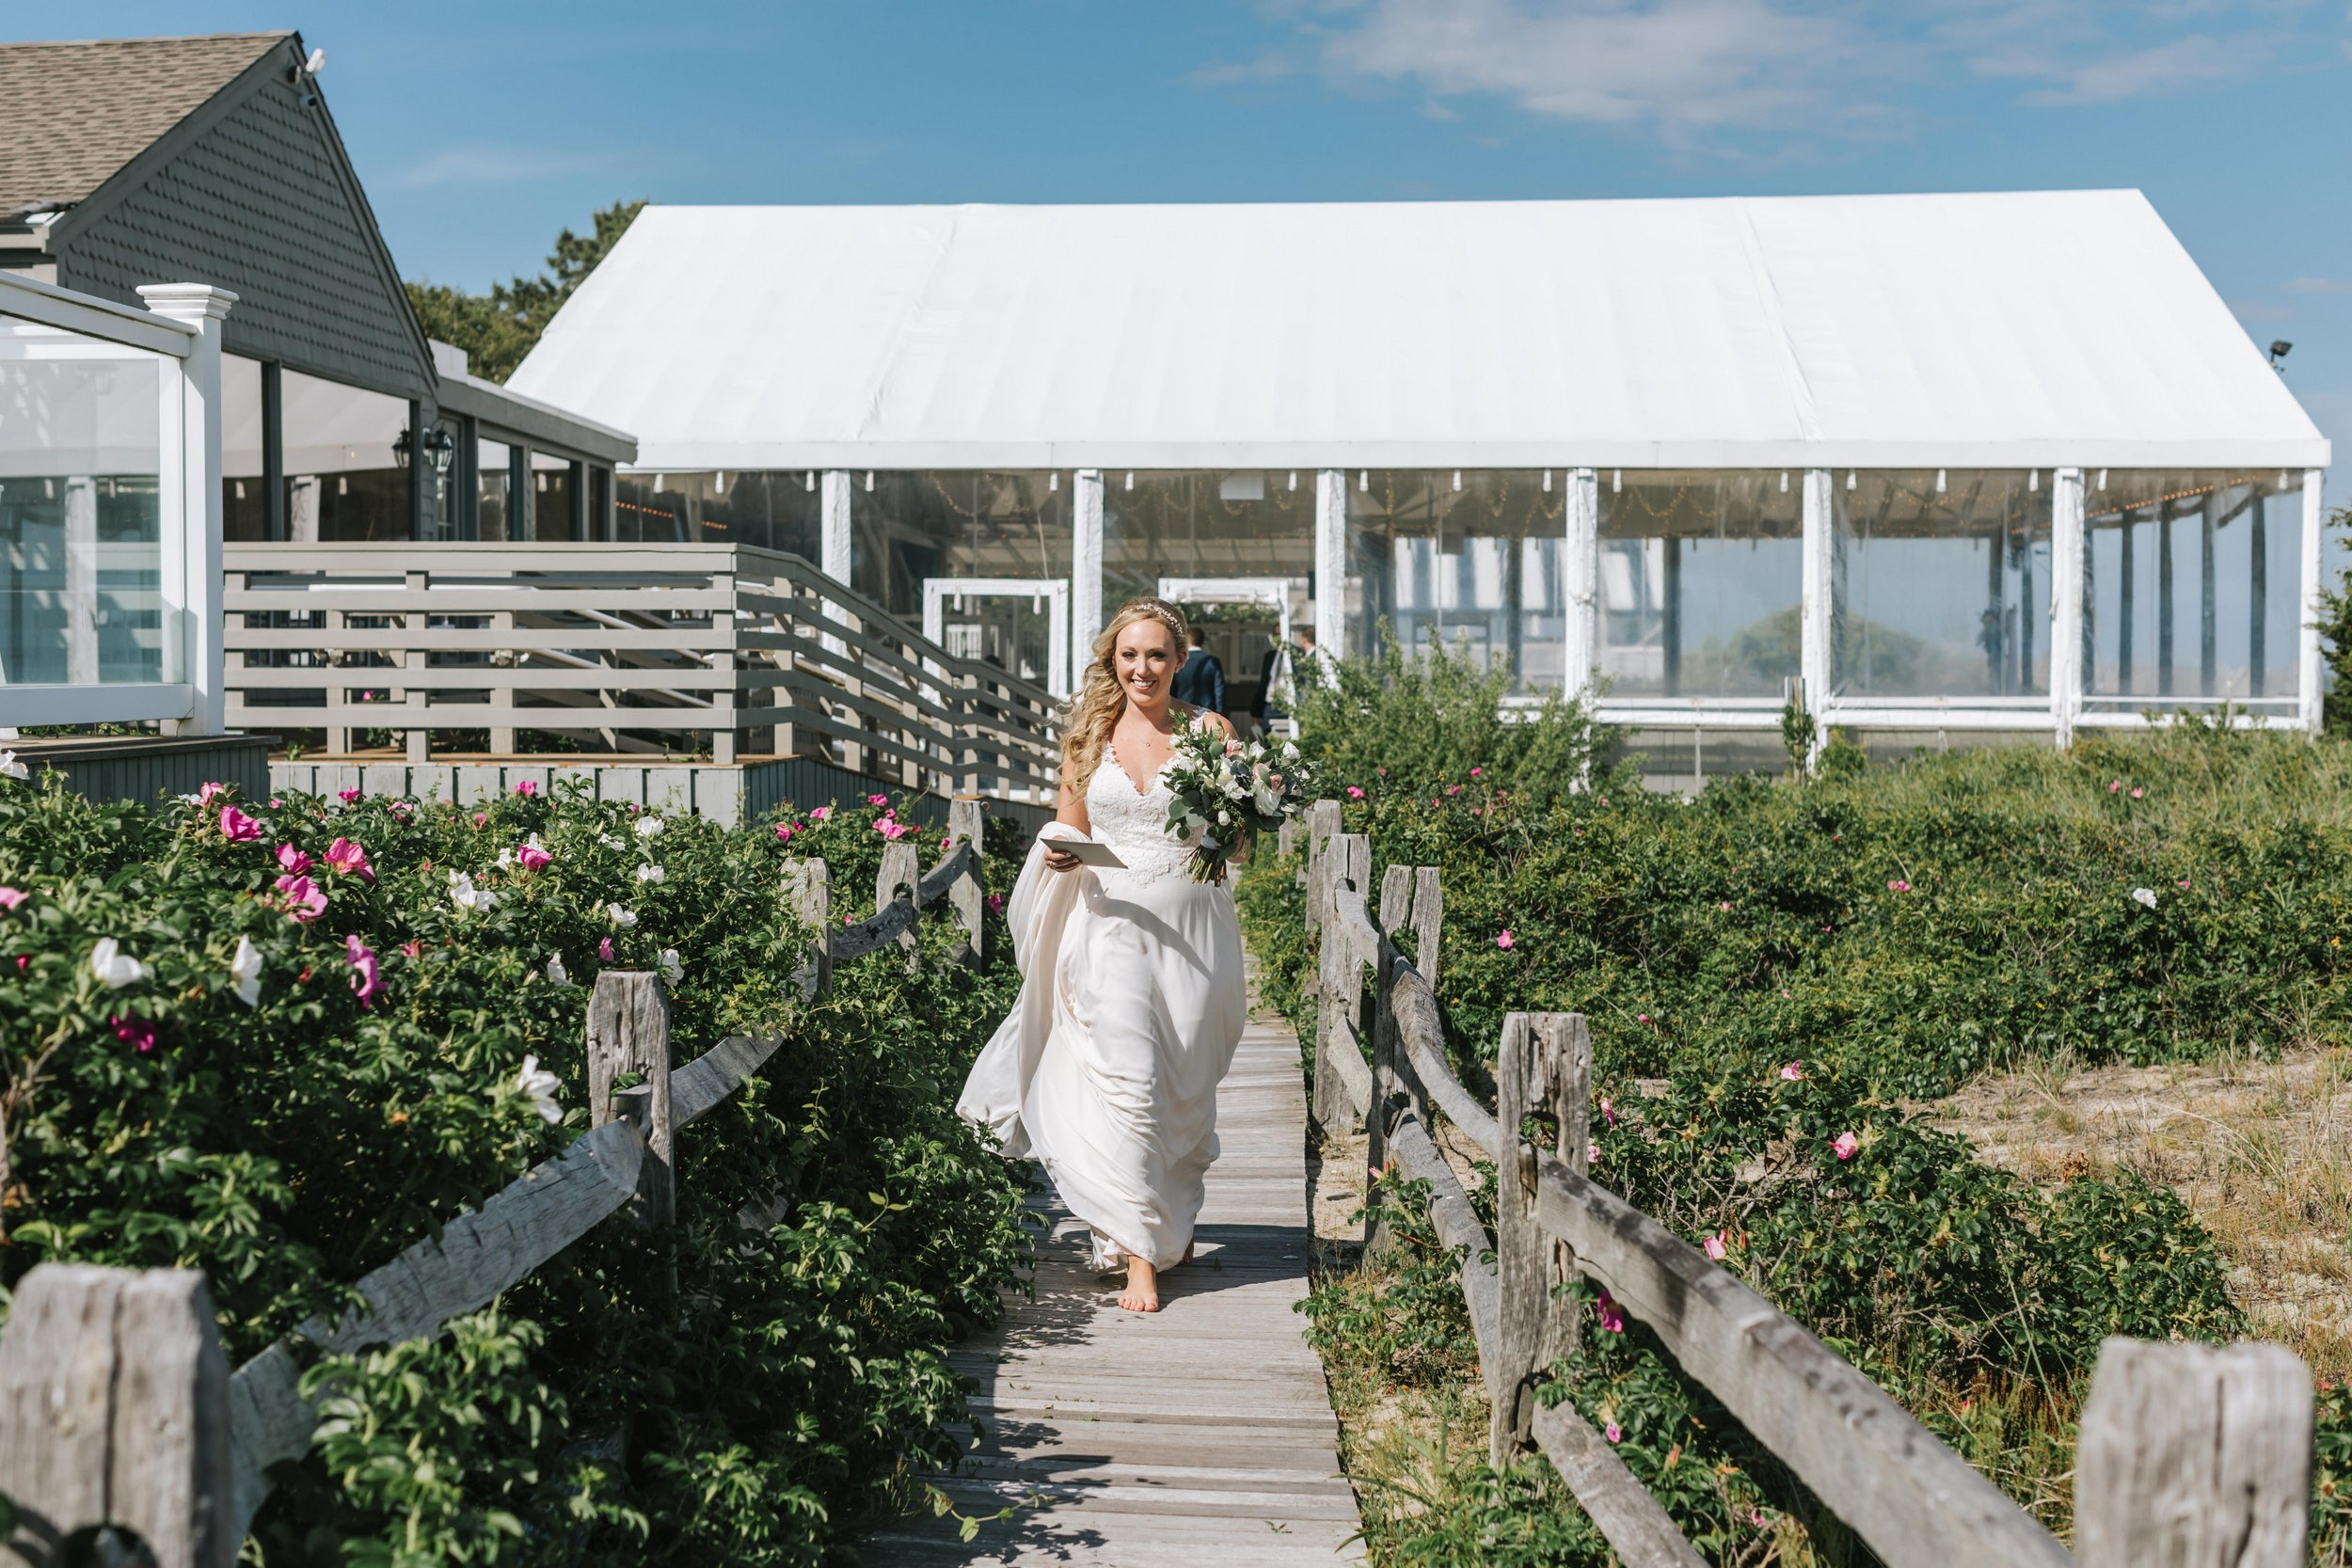 Popponesset-Inn-Wedding-Cape-Cod-Lena-Mirisola-Photography-17.jpg